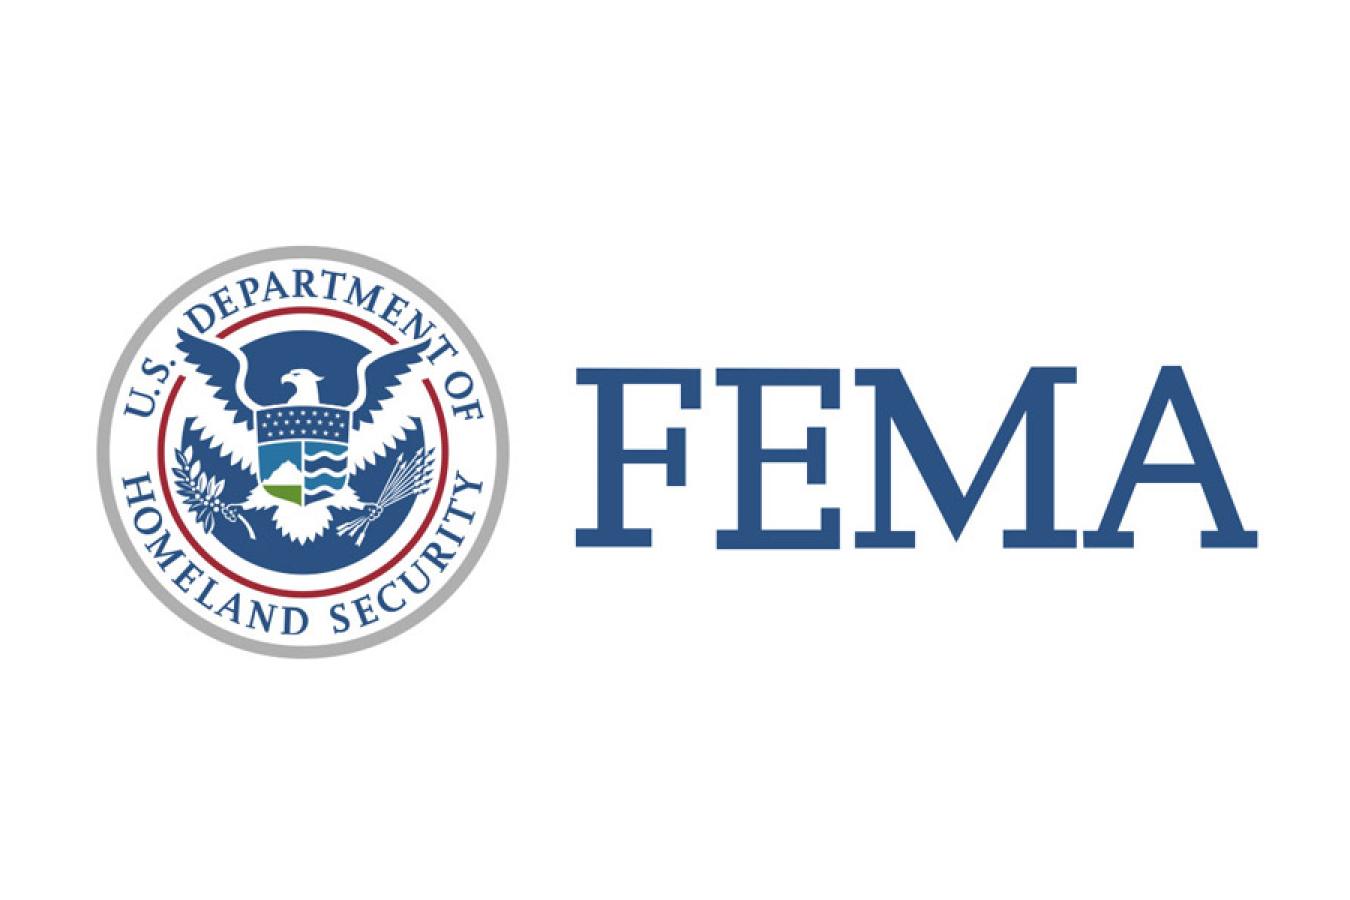 More than 13,000 migrant children in USA custody